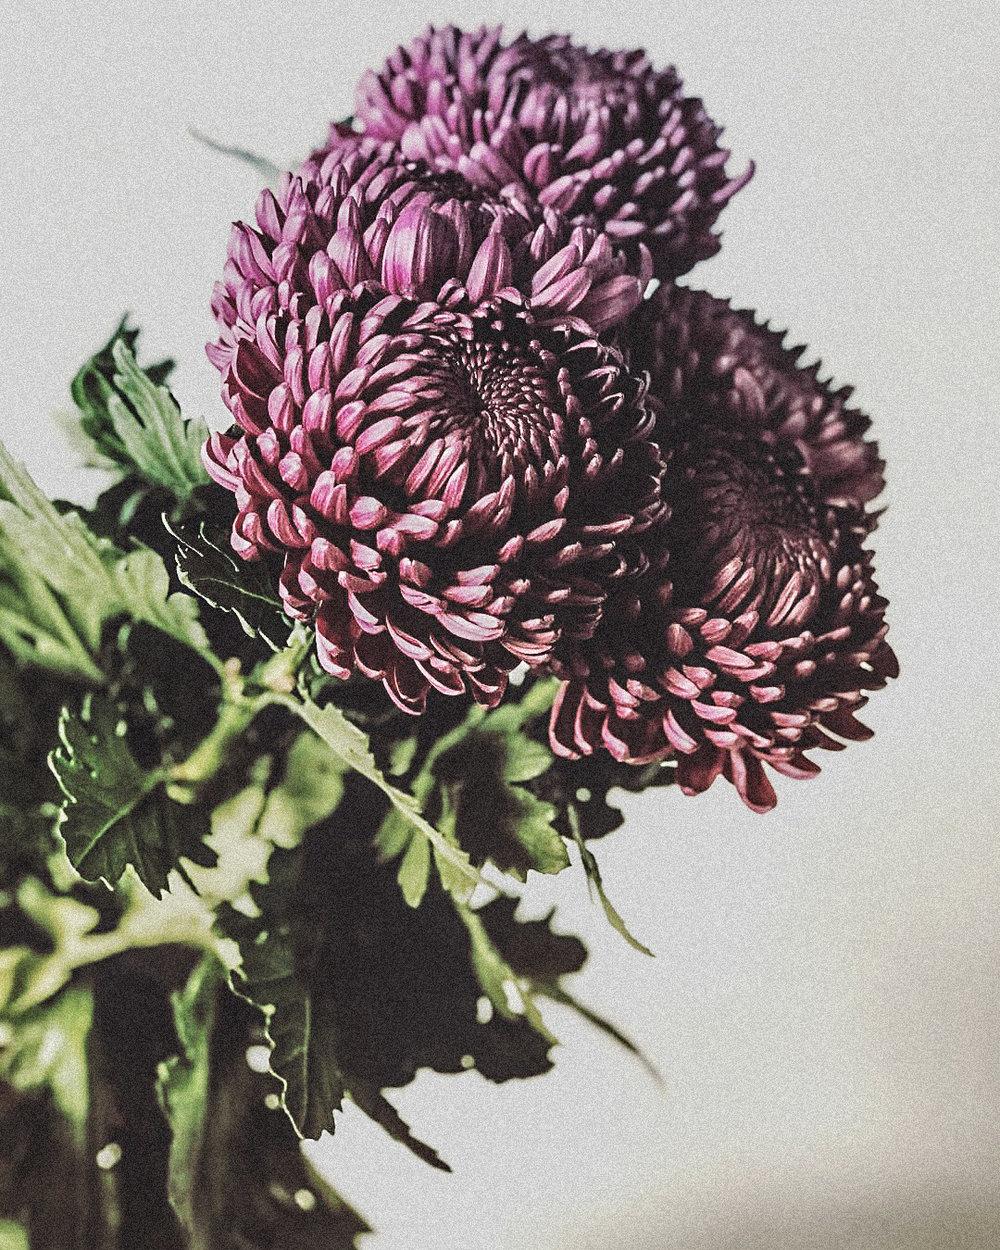 passiflora_blomst.jpg